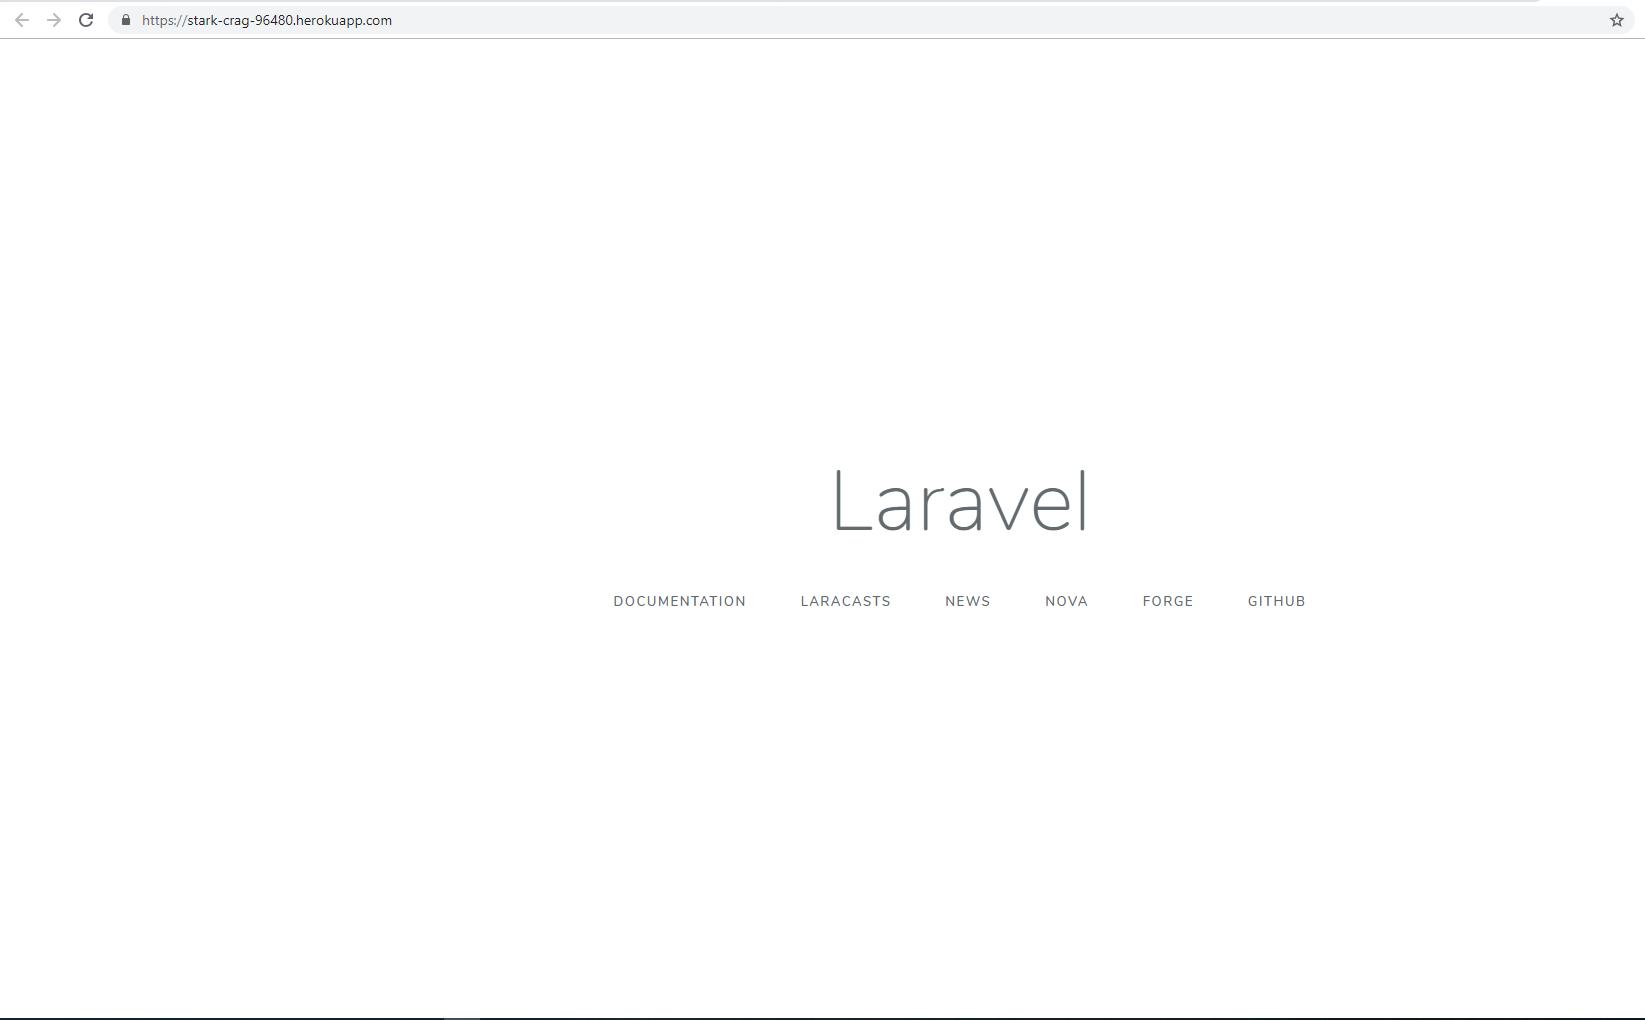 Deploy laravel app completed